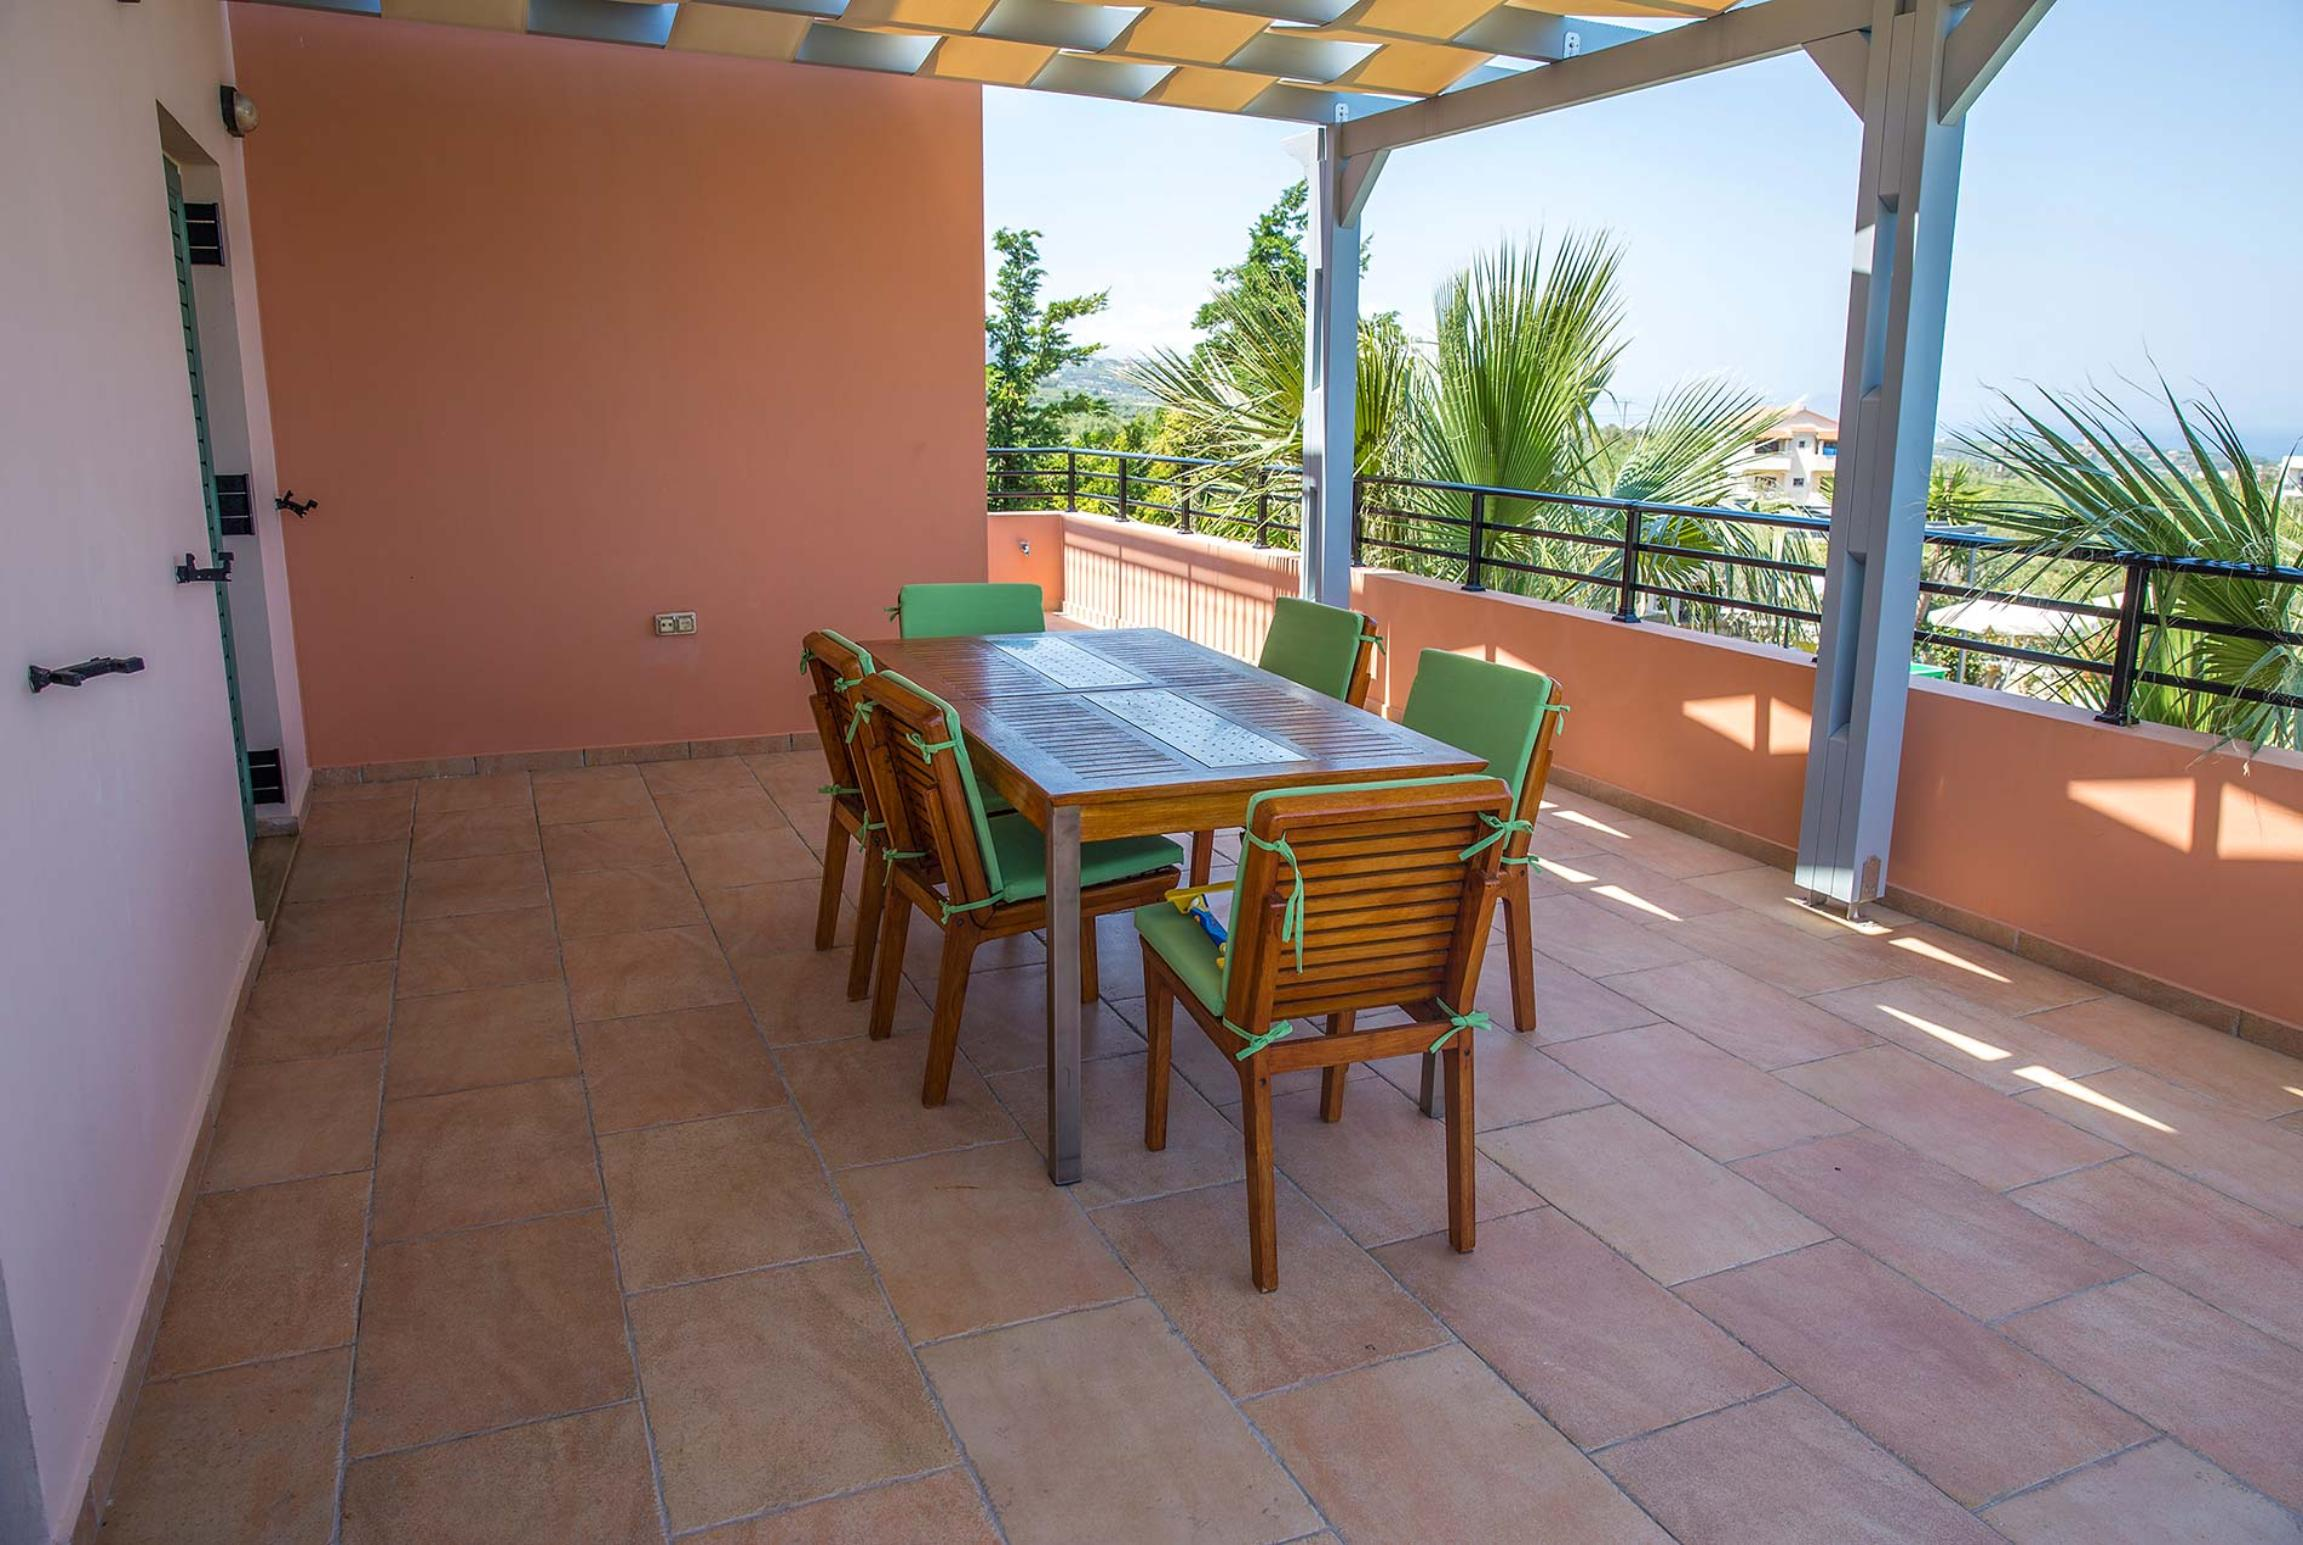 Ferienhaus Kyveli (2654321), Rethymno, Kreta Nordküste, Kreta, Griechenland, Bild 26